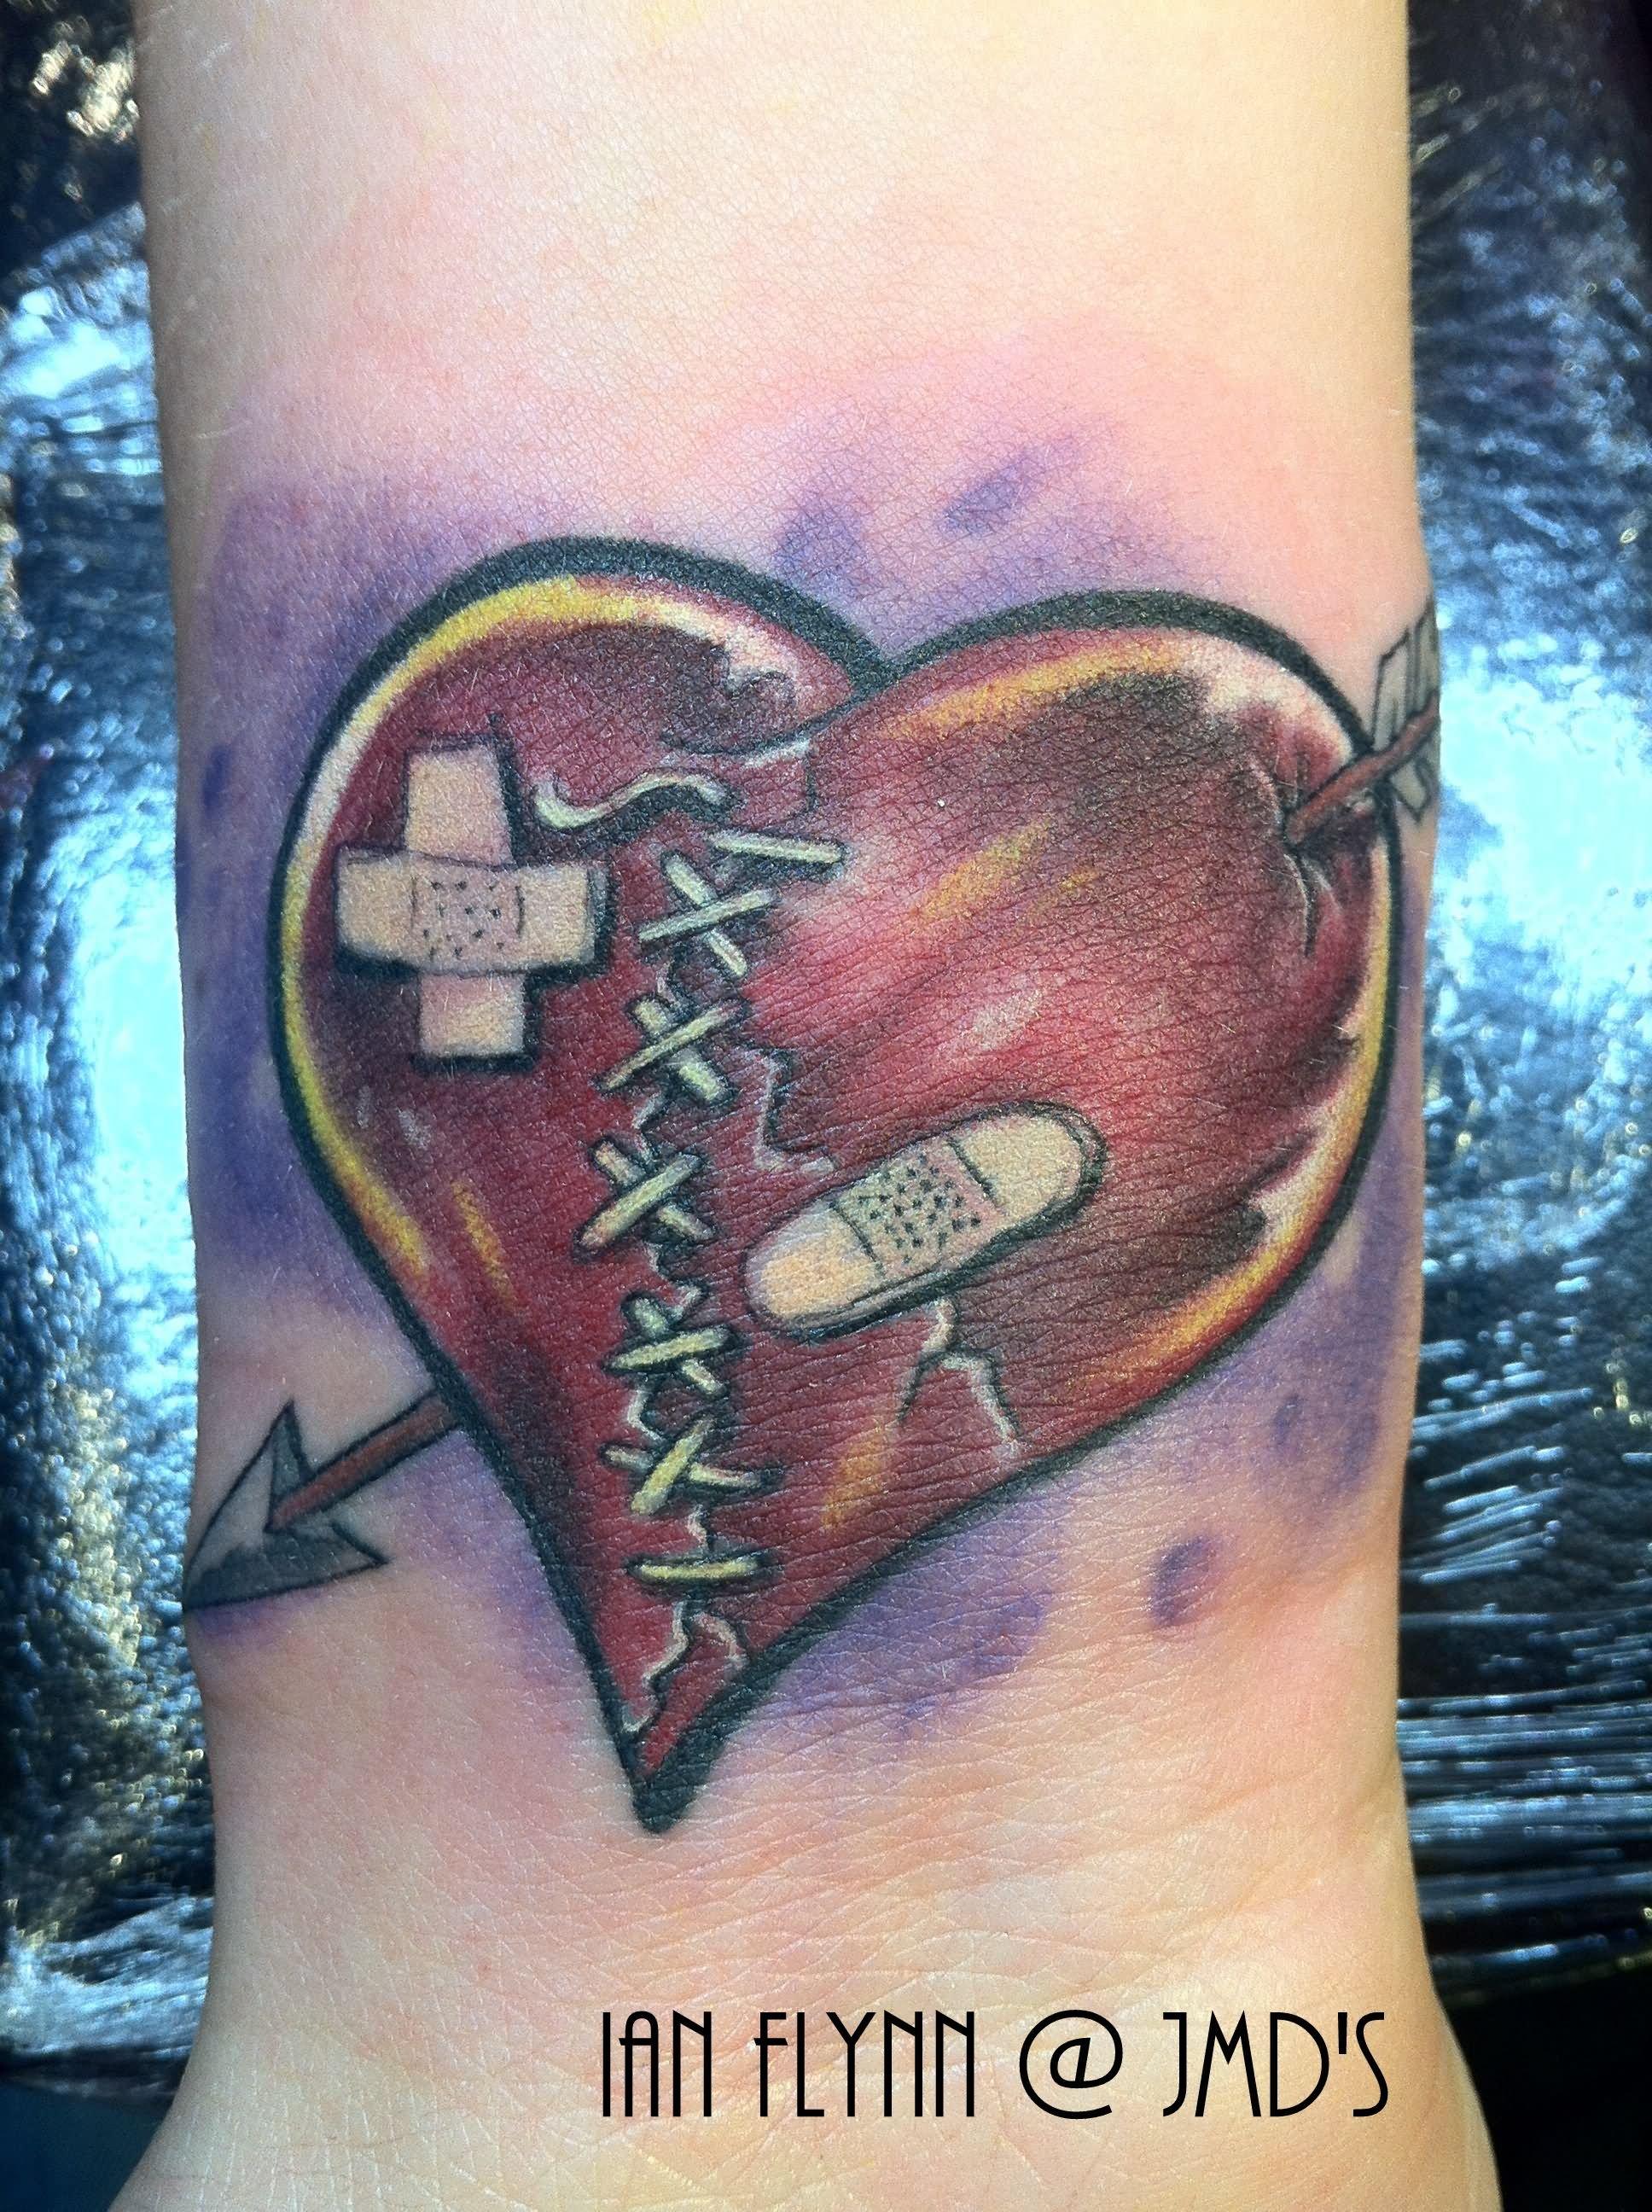 Red sewed broken heart tattoo on inner forearm